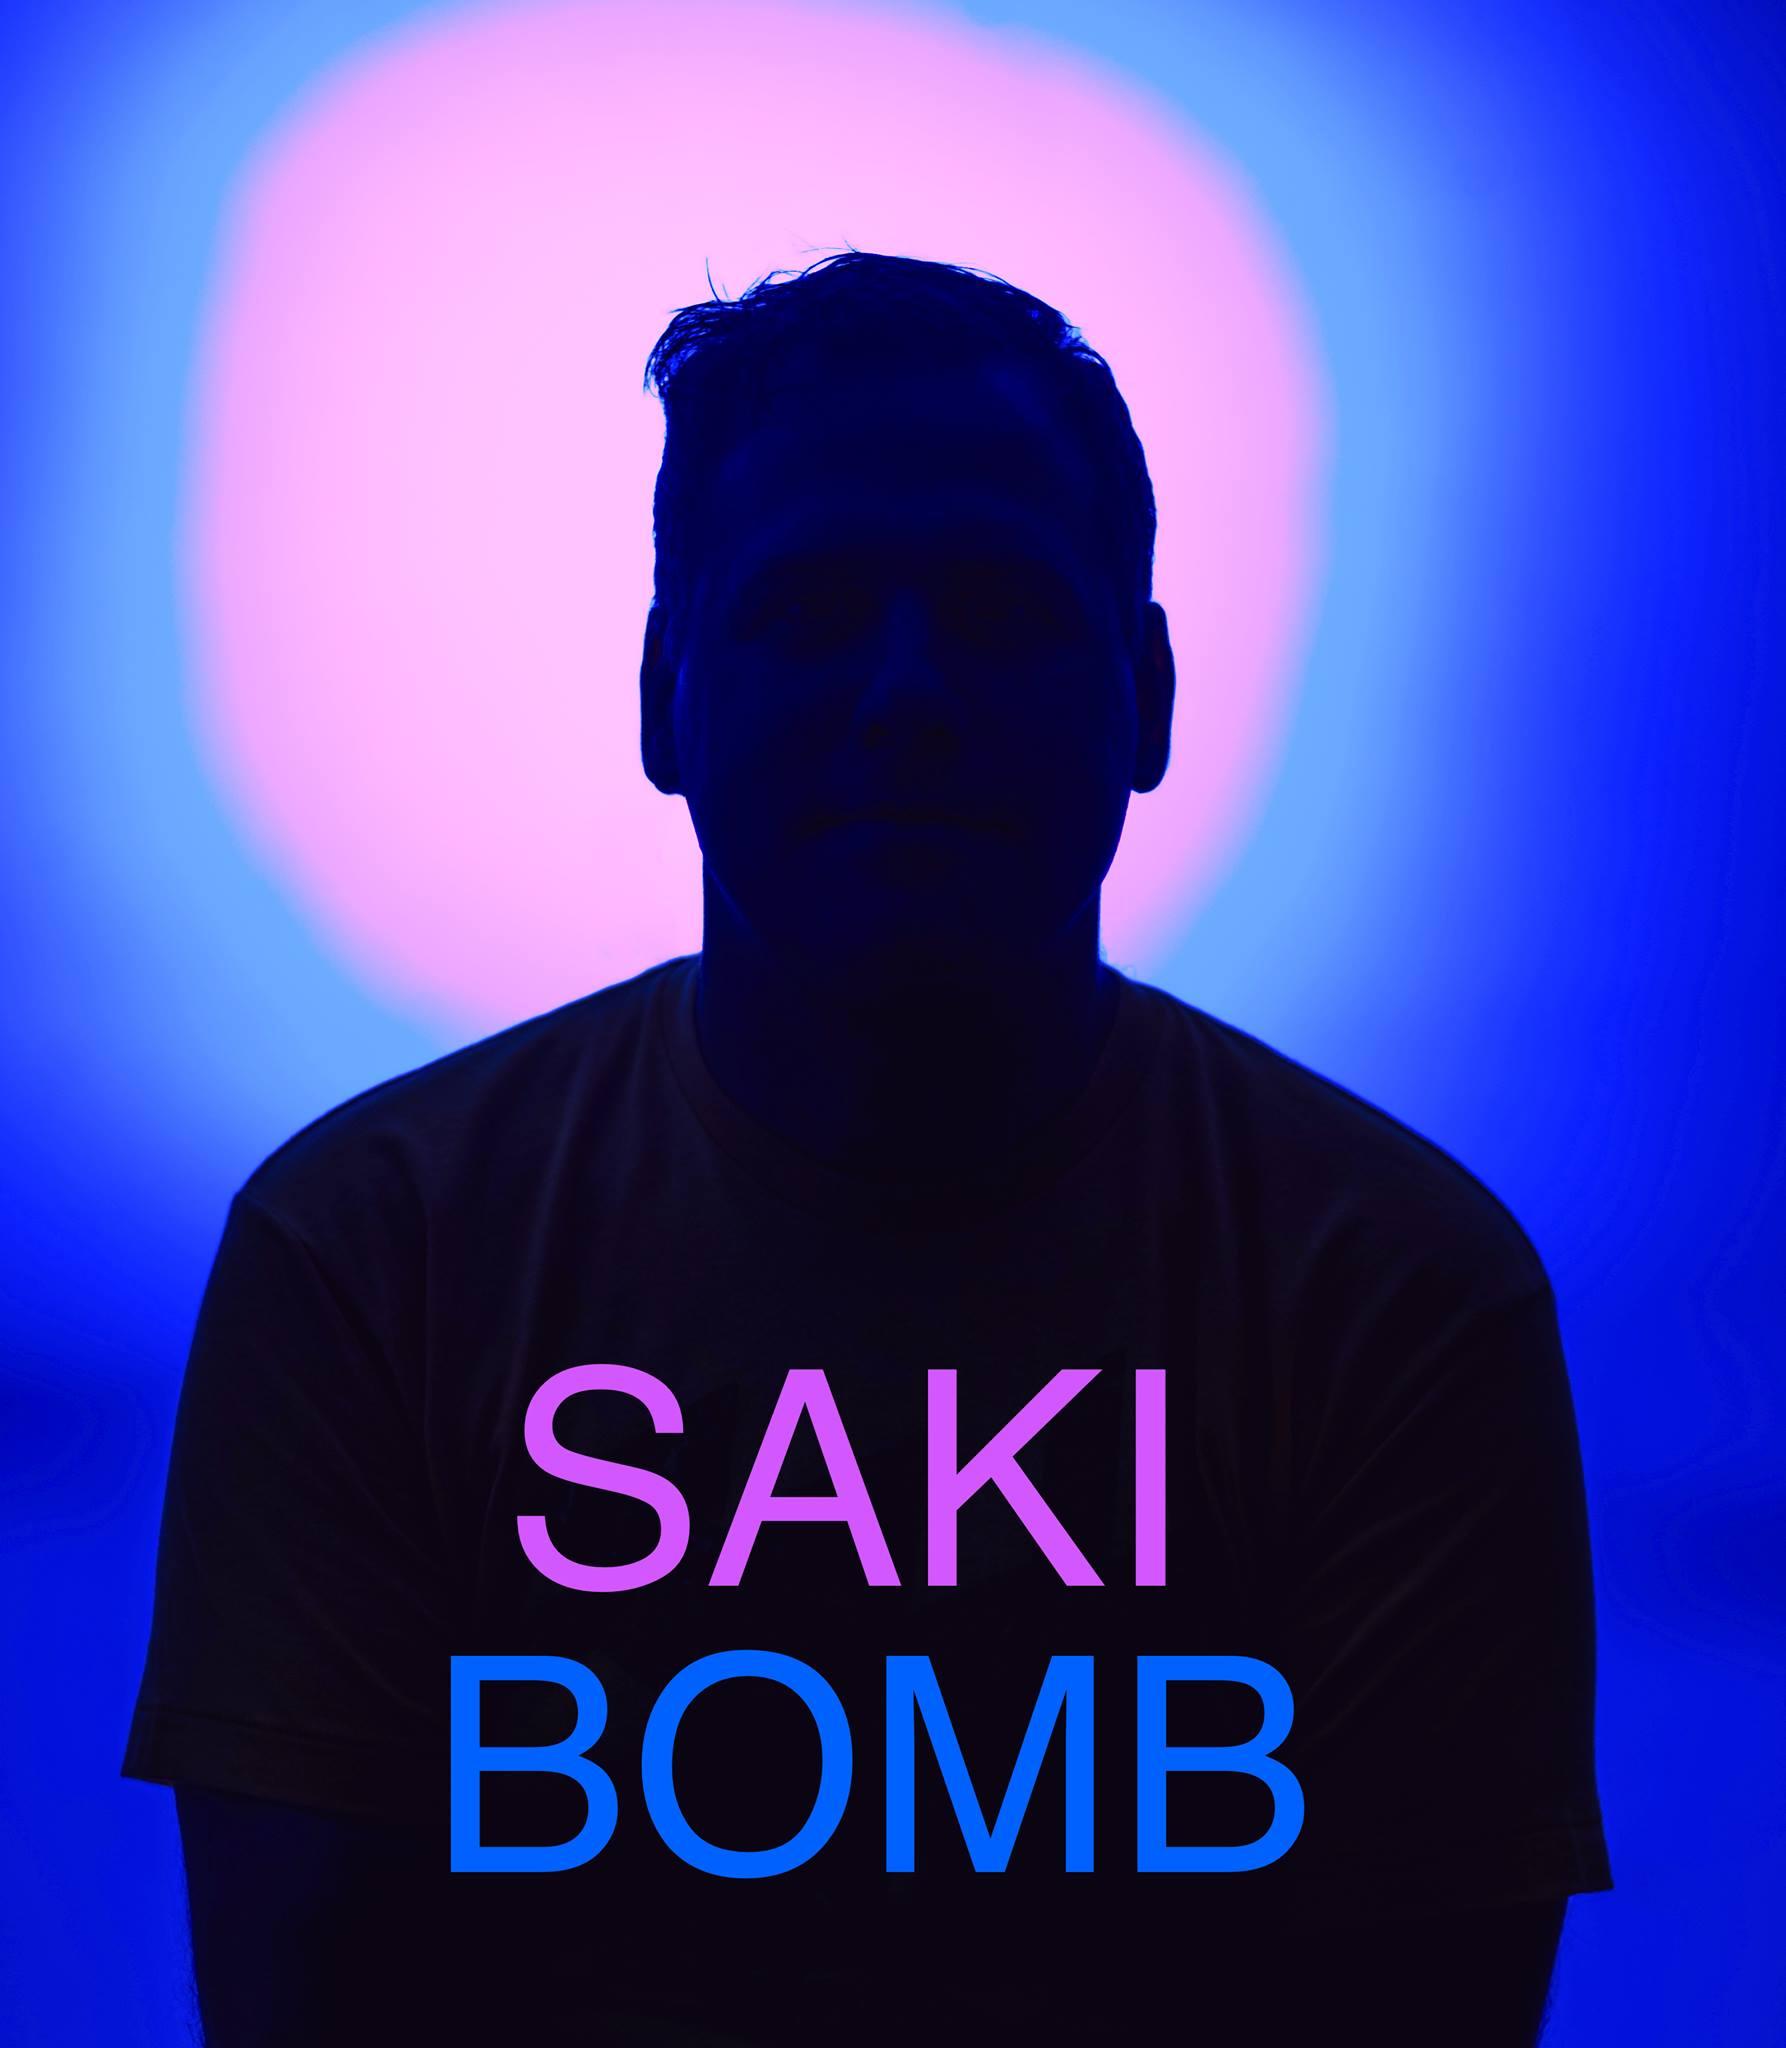 SAKI BOMB